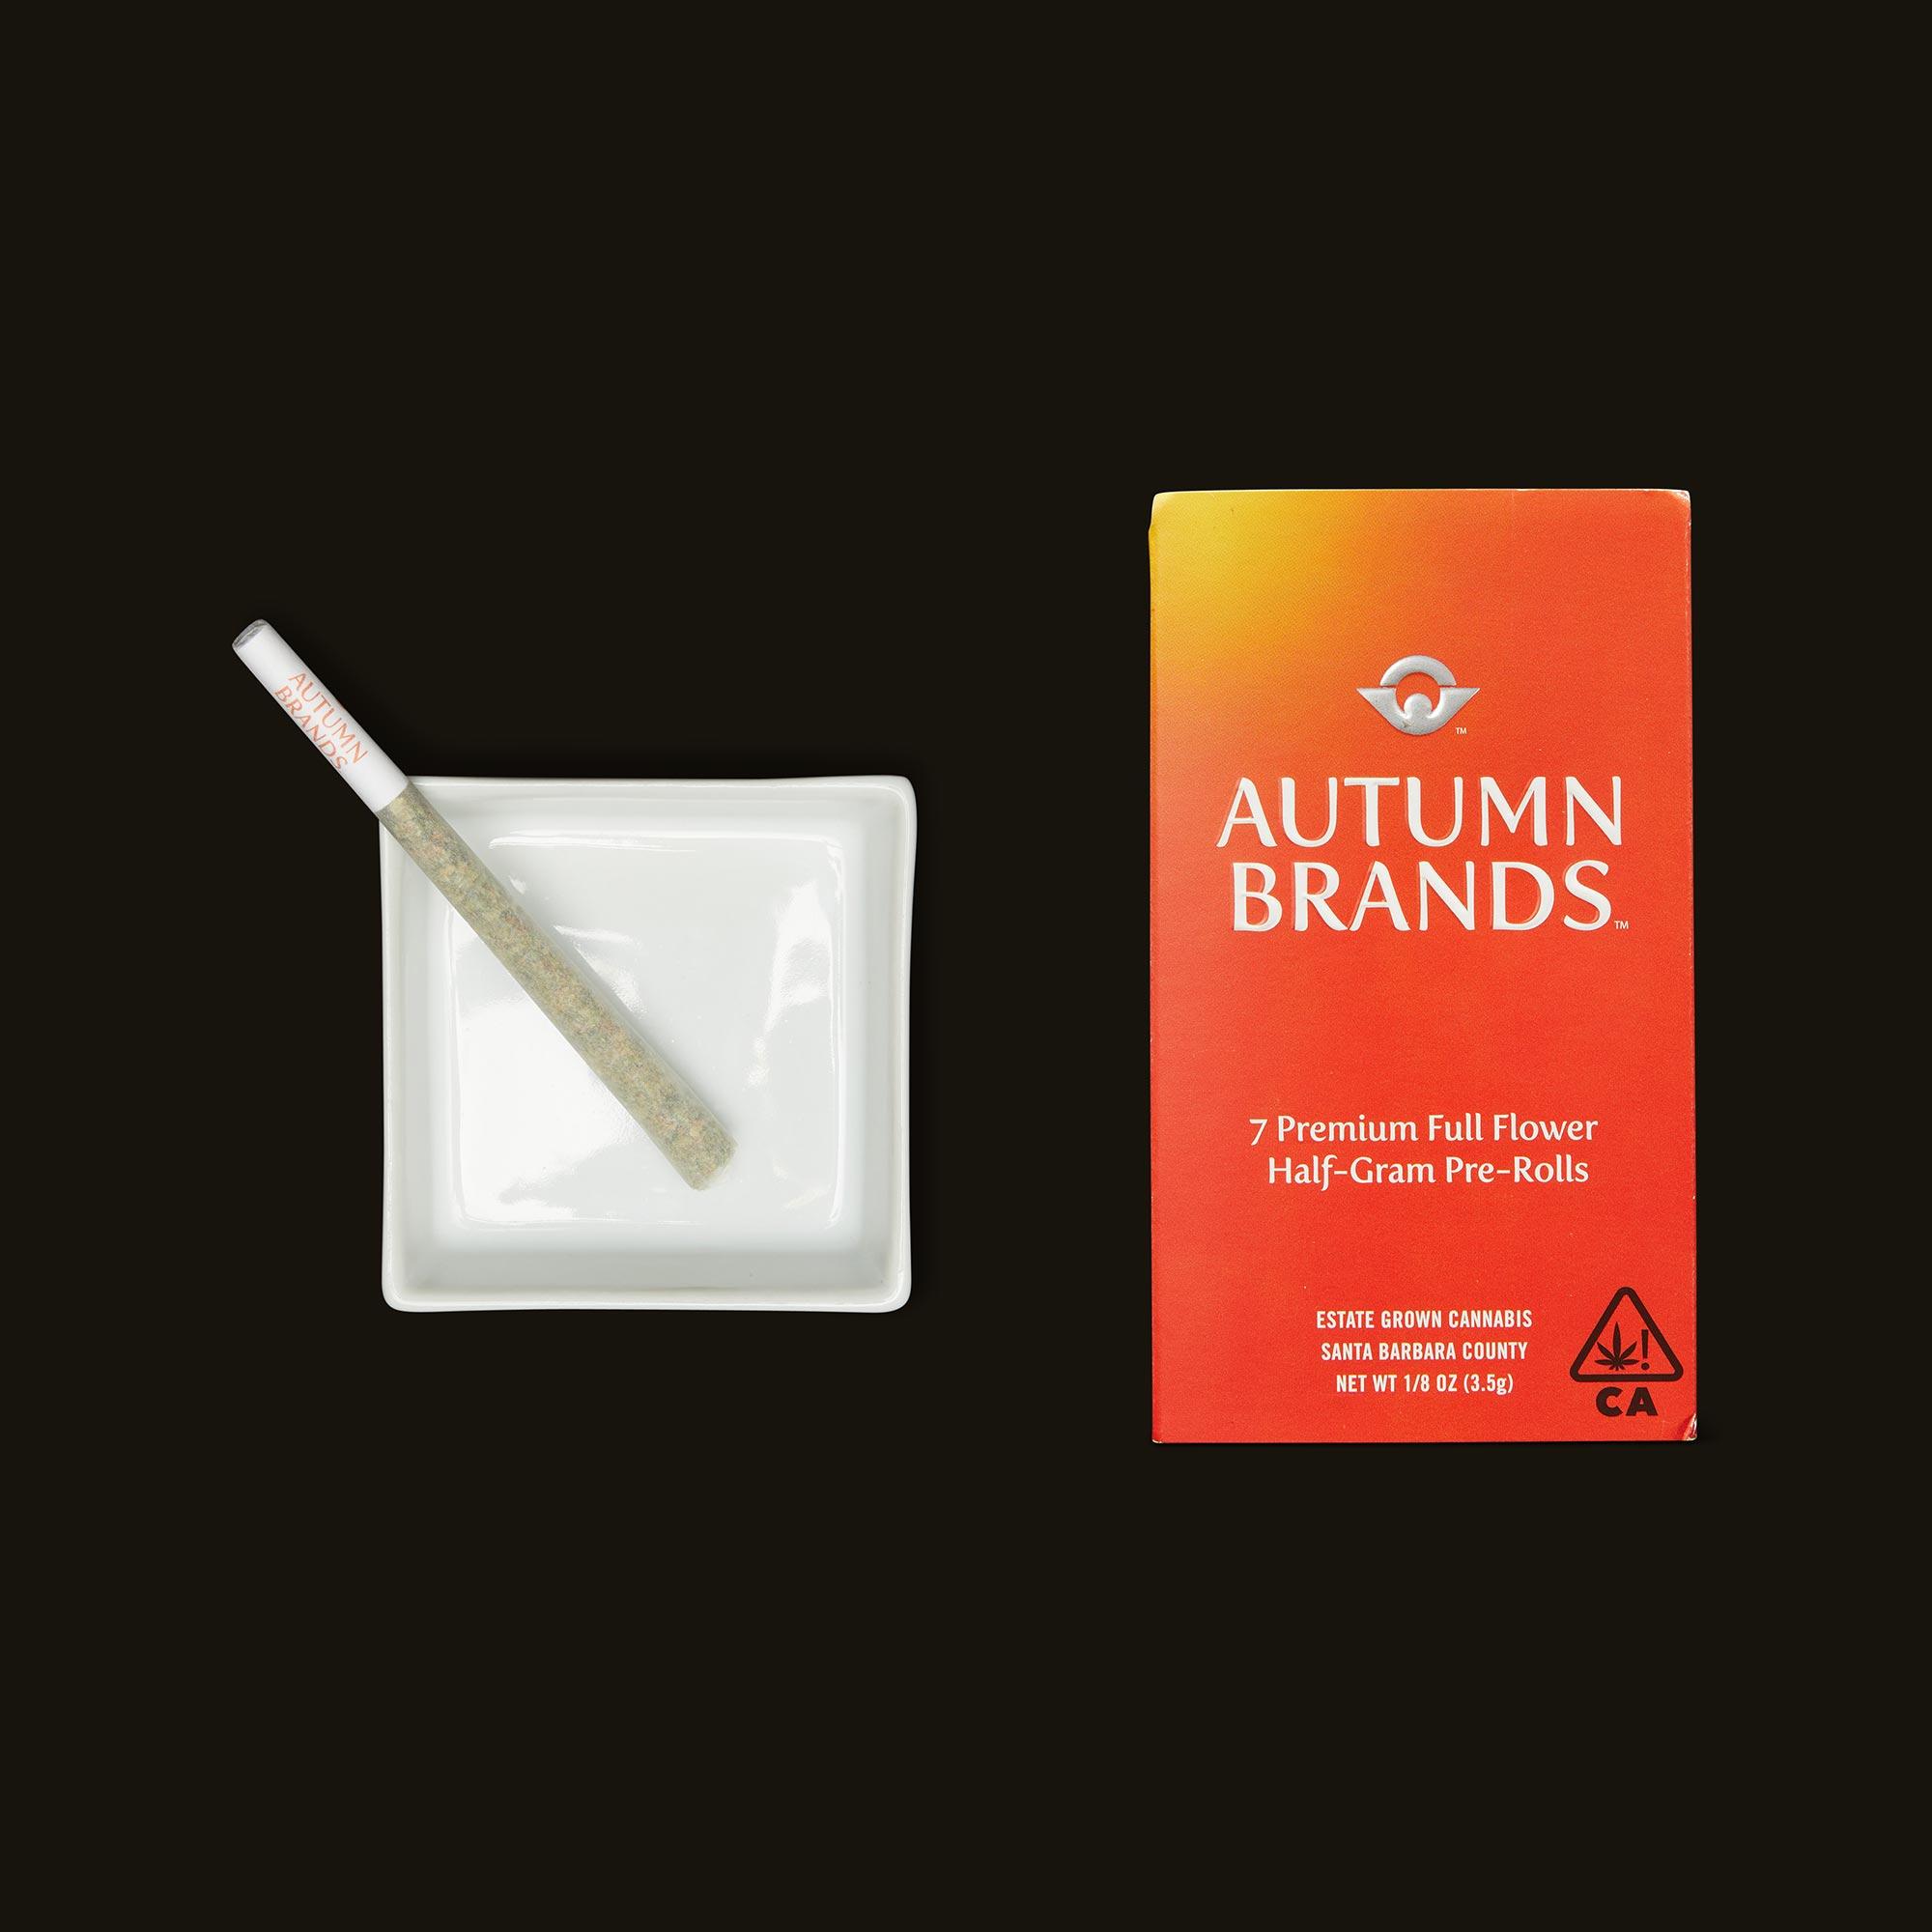 Autumn Brands Mother's Milk Pre-Roll Pack